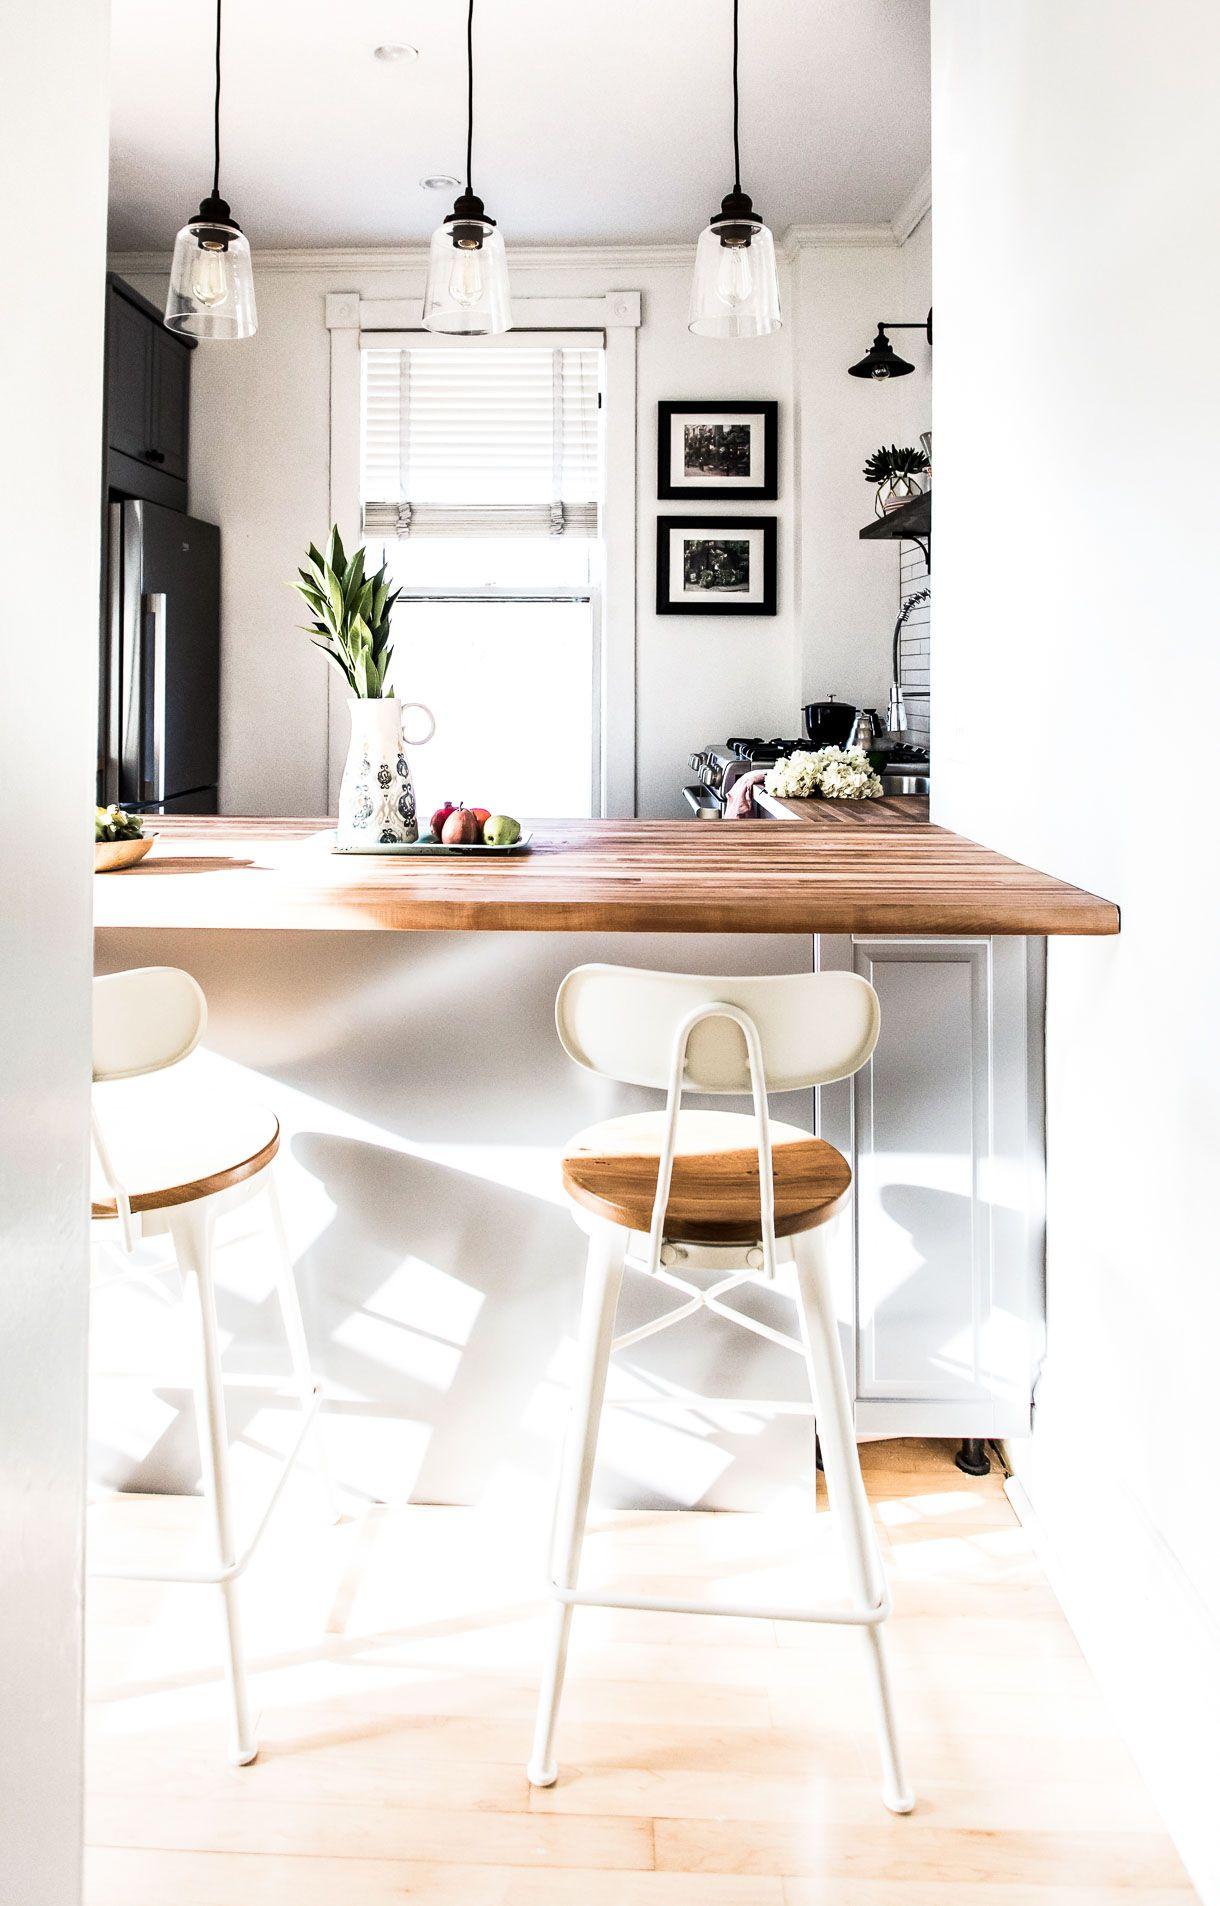 Heartbeet Home: A Modern Minimalist Kitchen Design For ...